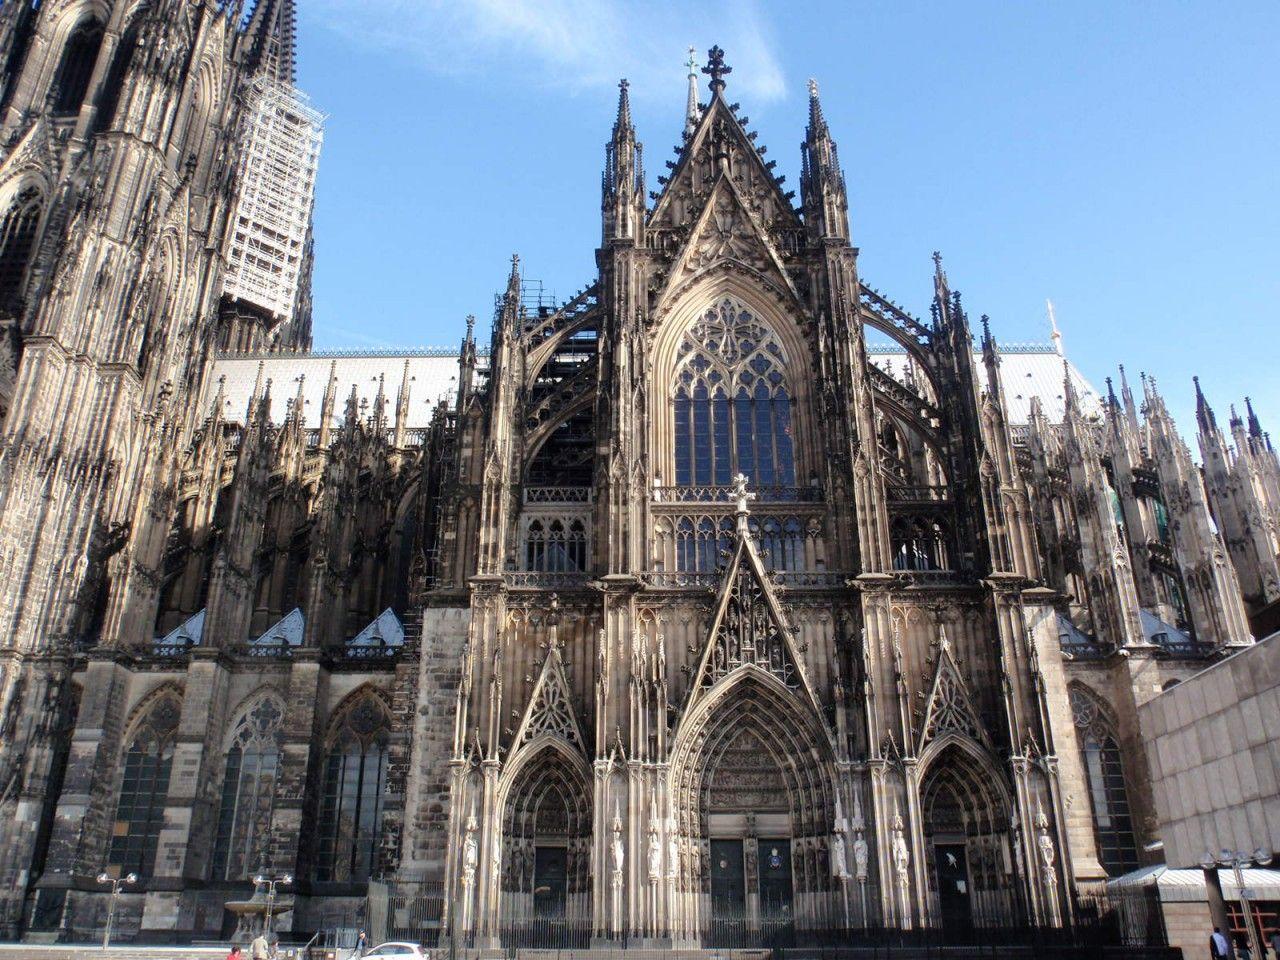 el g tico alem n catedral de colonia 1280 catedrales g ticas pinterest el gotico. Black Bedroom Furniture Sets. Home Design Ideas